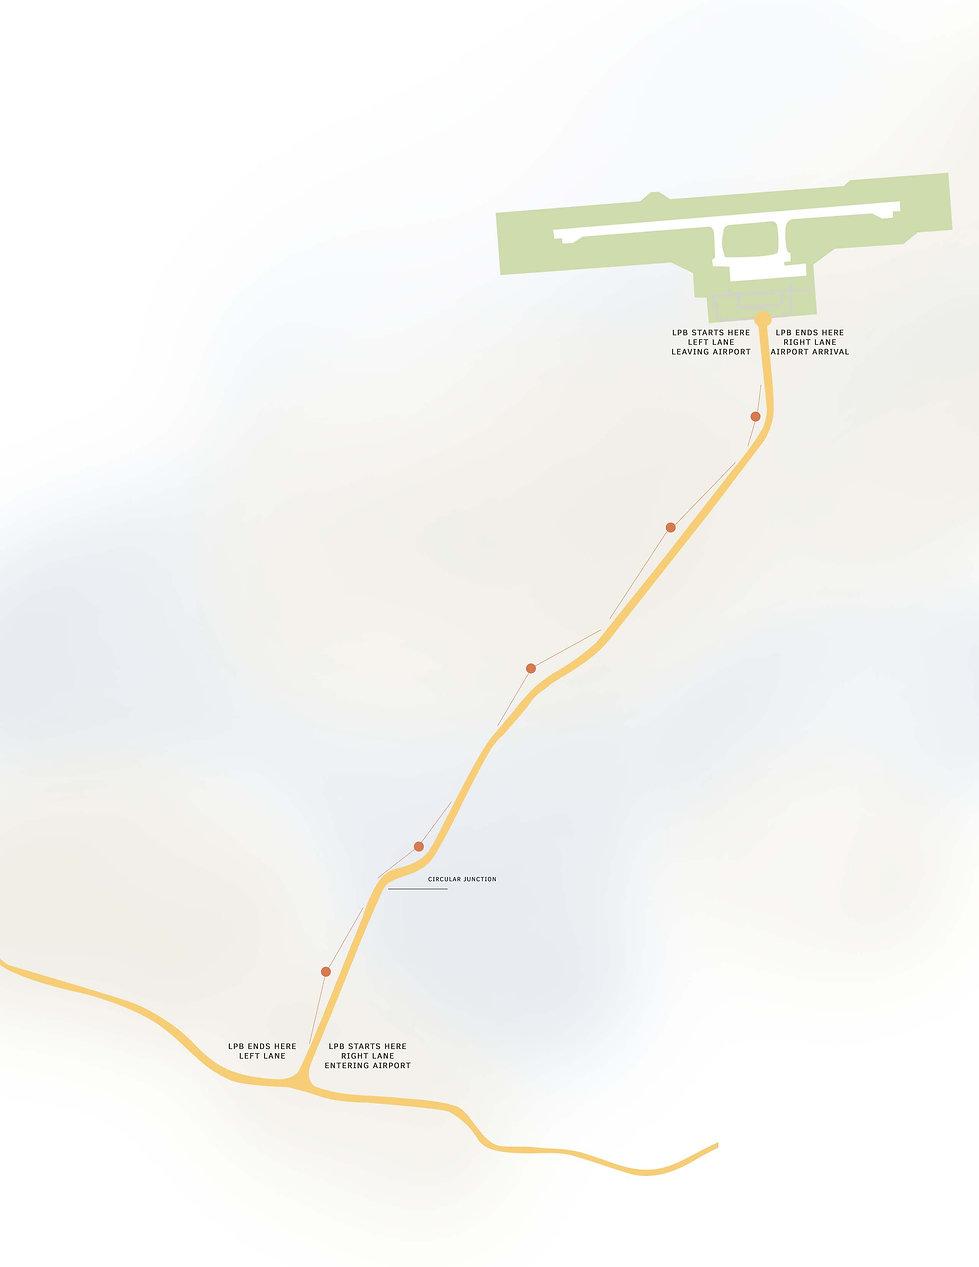 LAMPPOST MAP.jpg